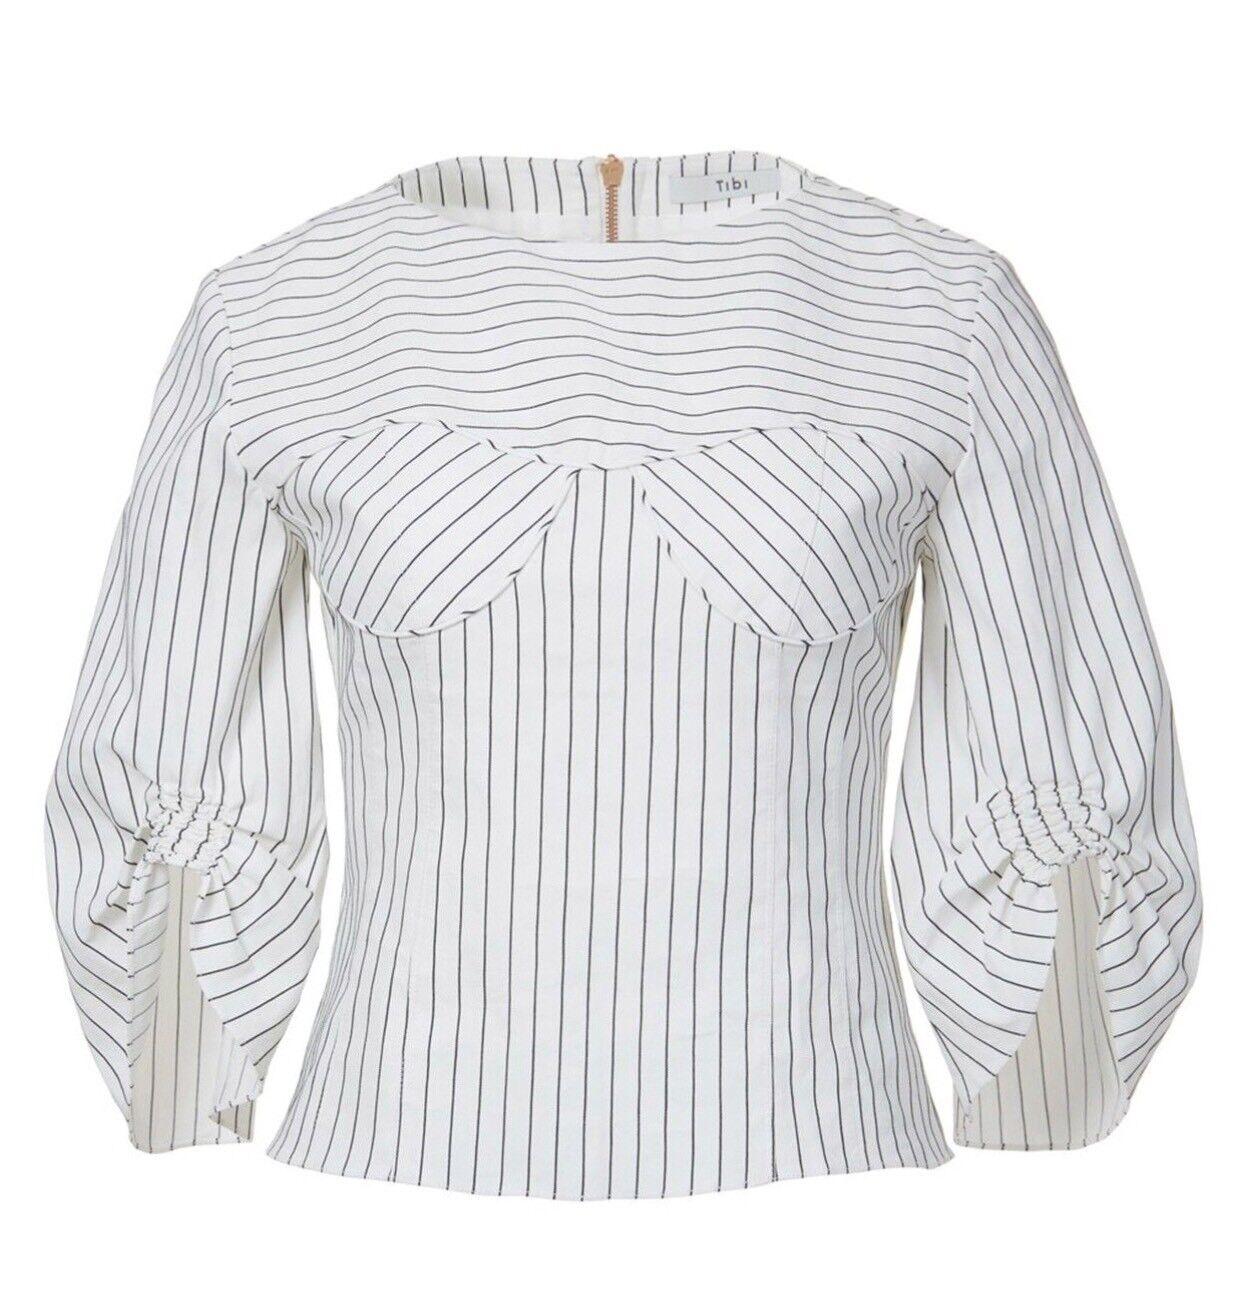 TIBI CECIL STRIPE PEPLUM CORSET TOP Blouse Linen Cotton Größe 2 New With Tag 425